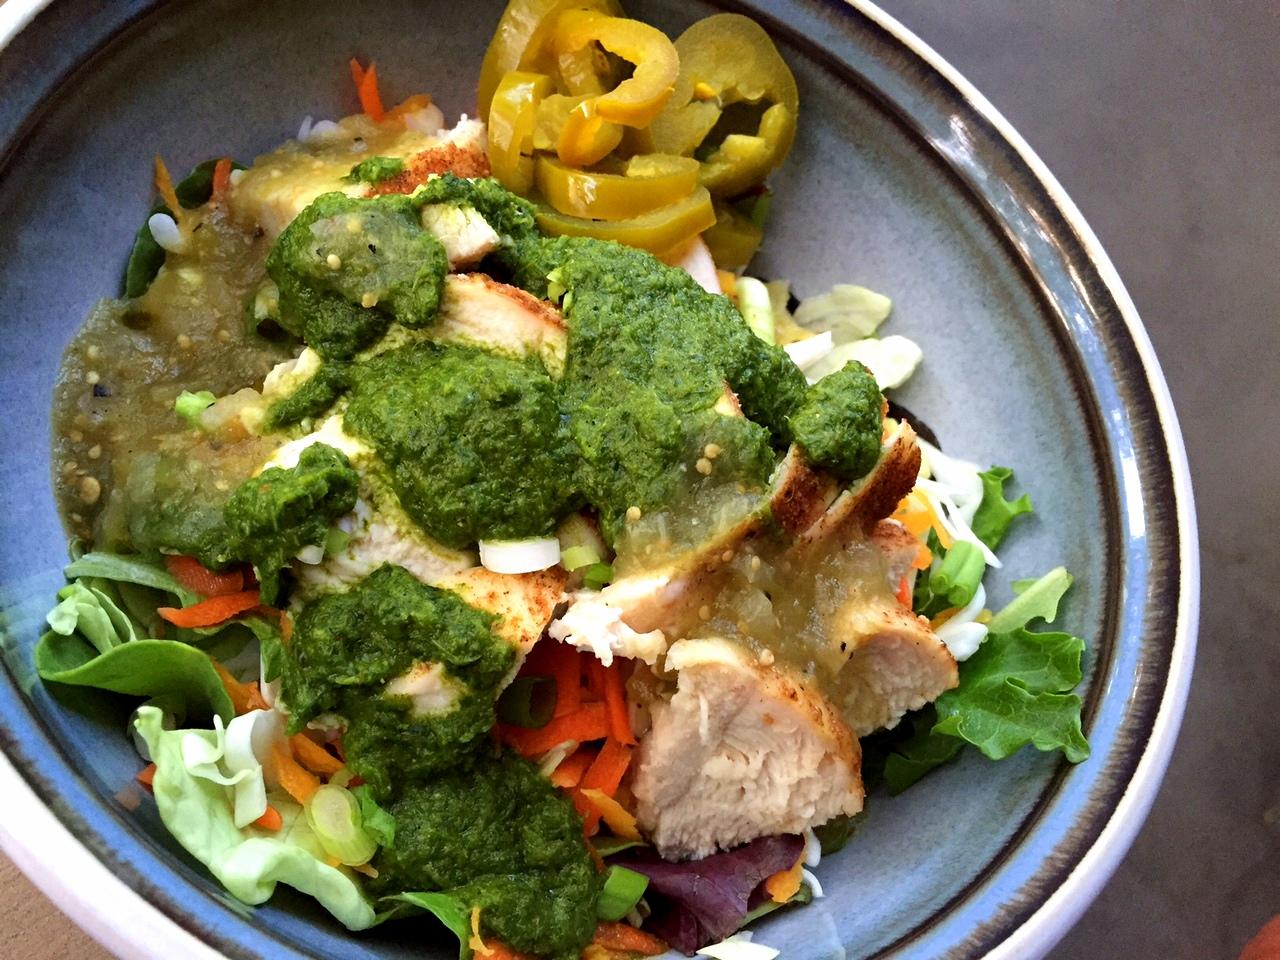 Paleo Chicken Taco Salad with Chimichurri Sauce